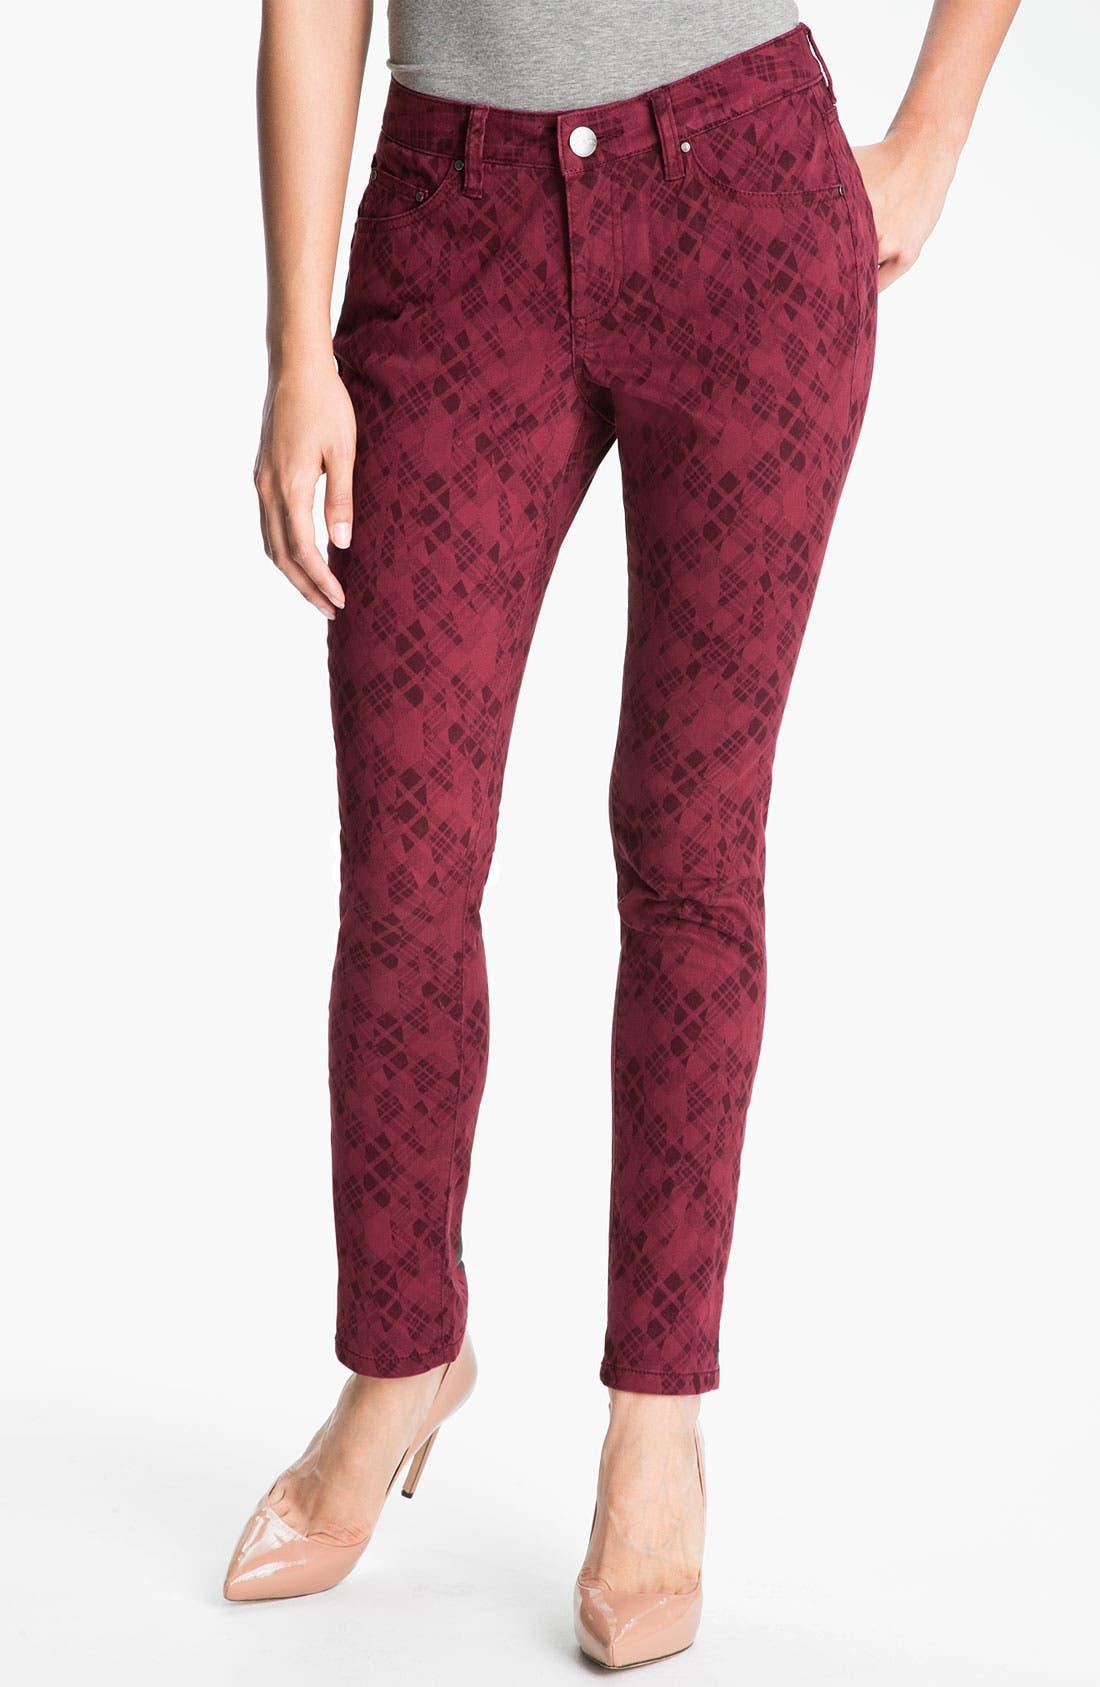 Alternate Image 1 Selected - Jag Jeans 'Chloe - Kingston Plaid' Skinny Jeans (Petite) (Online Exclusive)